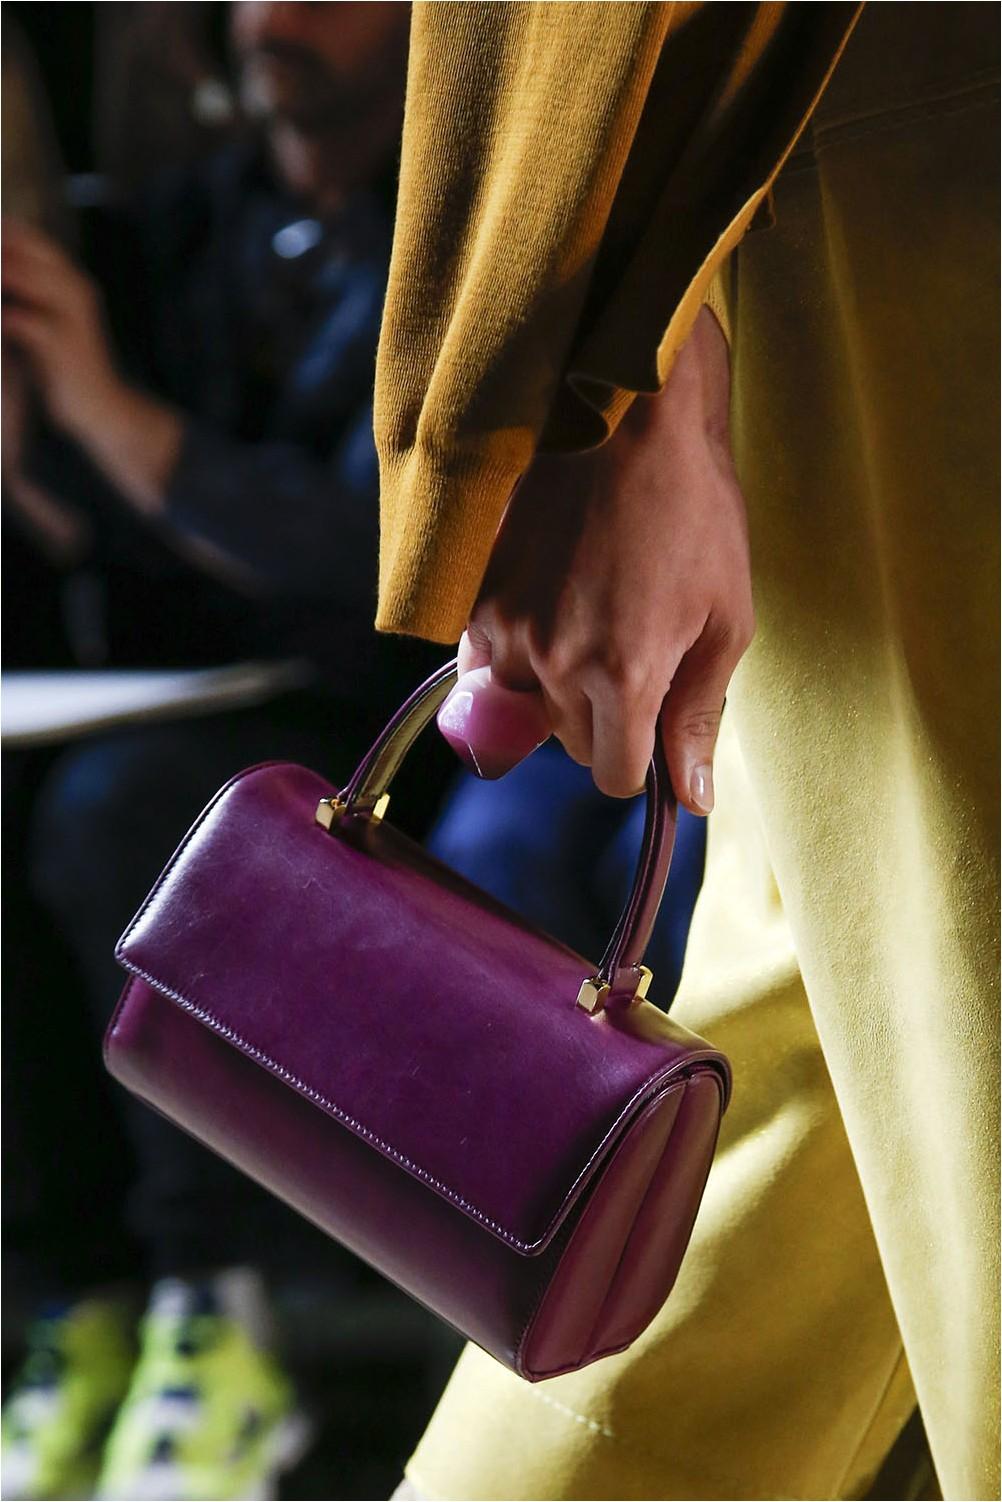 Handheld Marc Jacobs Bag